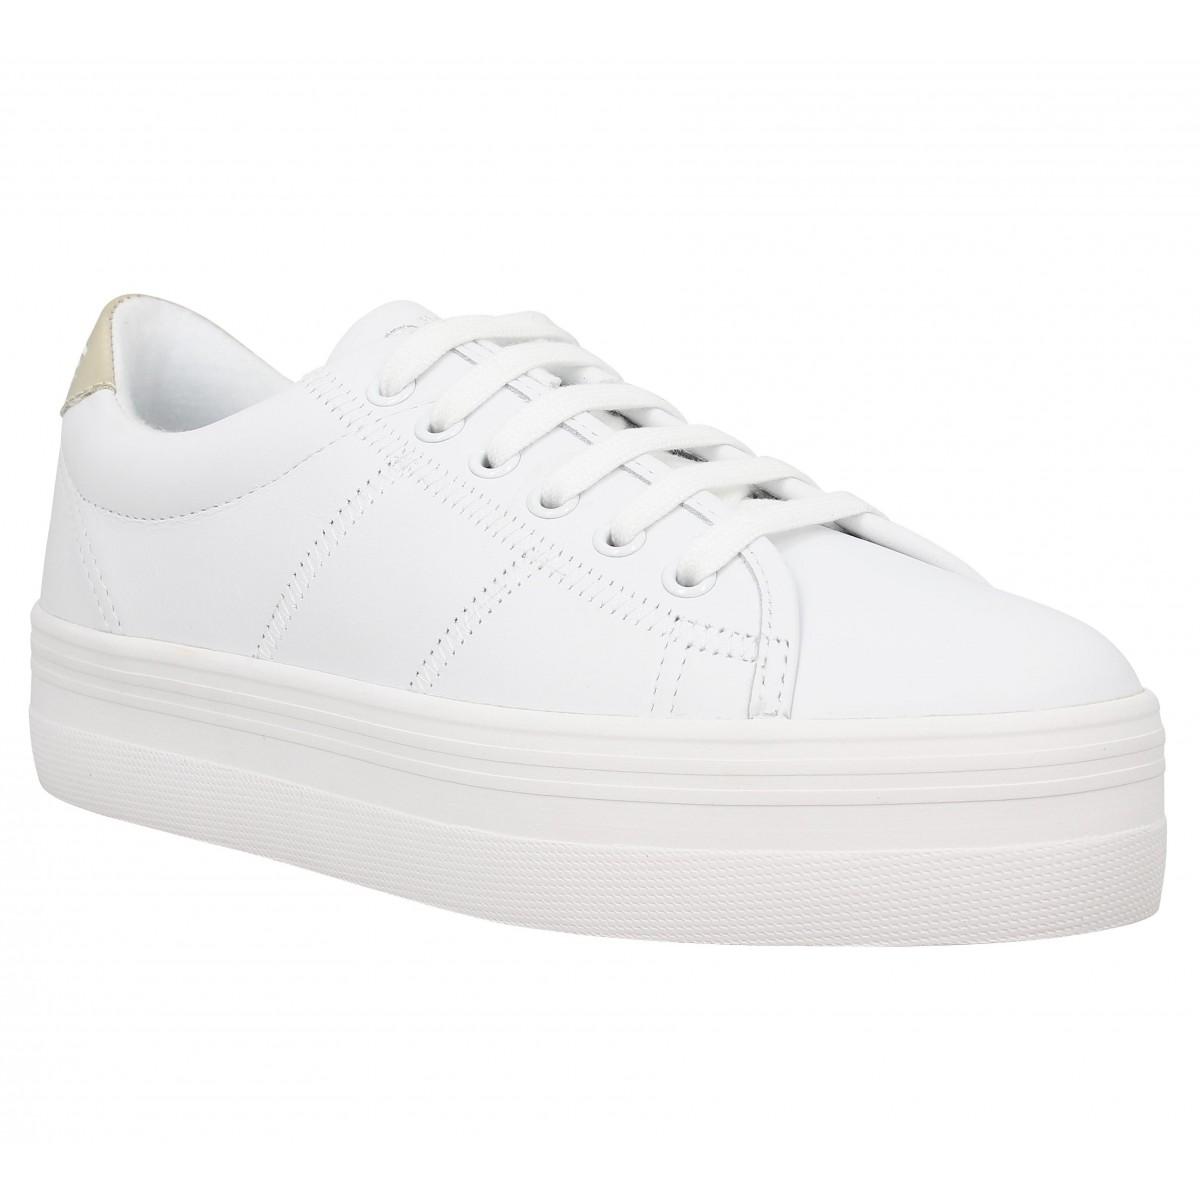 Compensées NO NAME Plato Sneaker cuir Femme Blanc Or